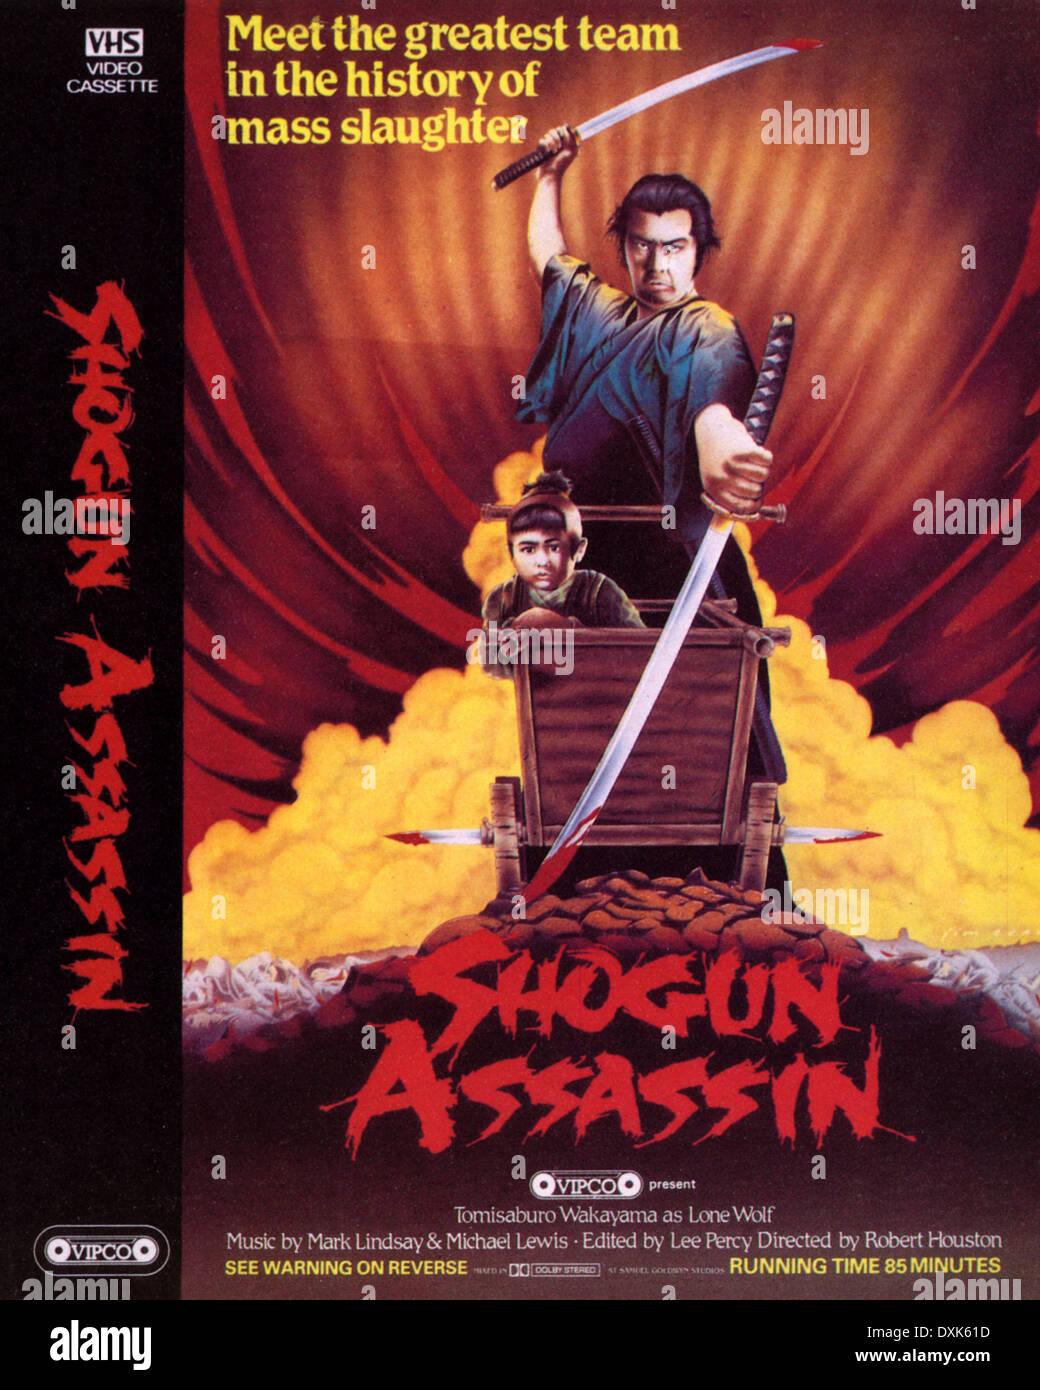 SHOGUN ASSASSIN (1980) BILD AUS DEM RONALD GRANT ARCHIV Stockbild